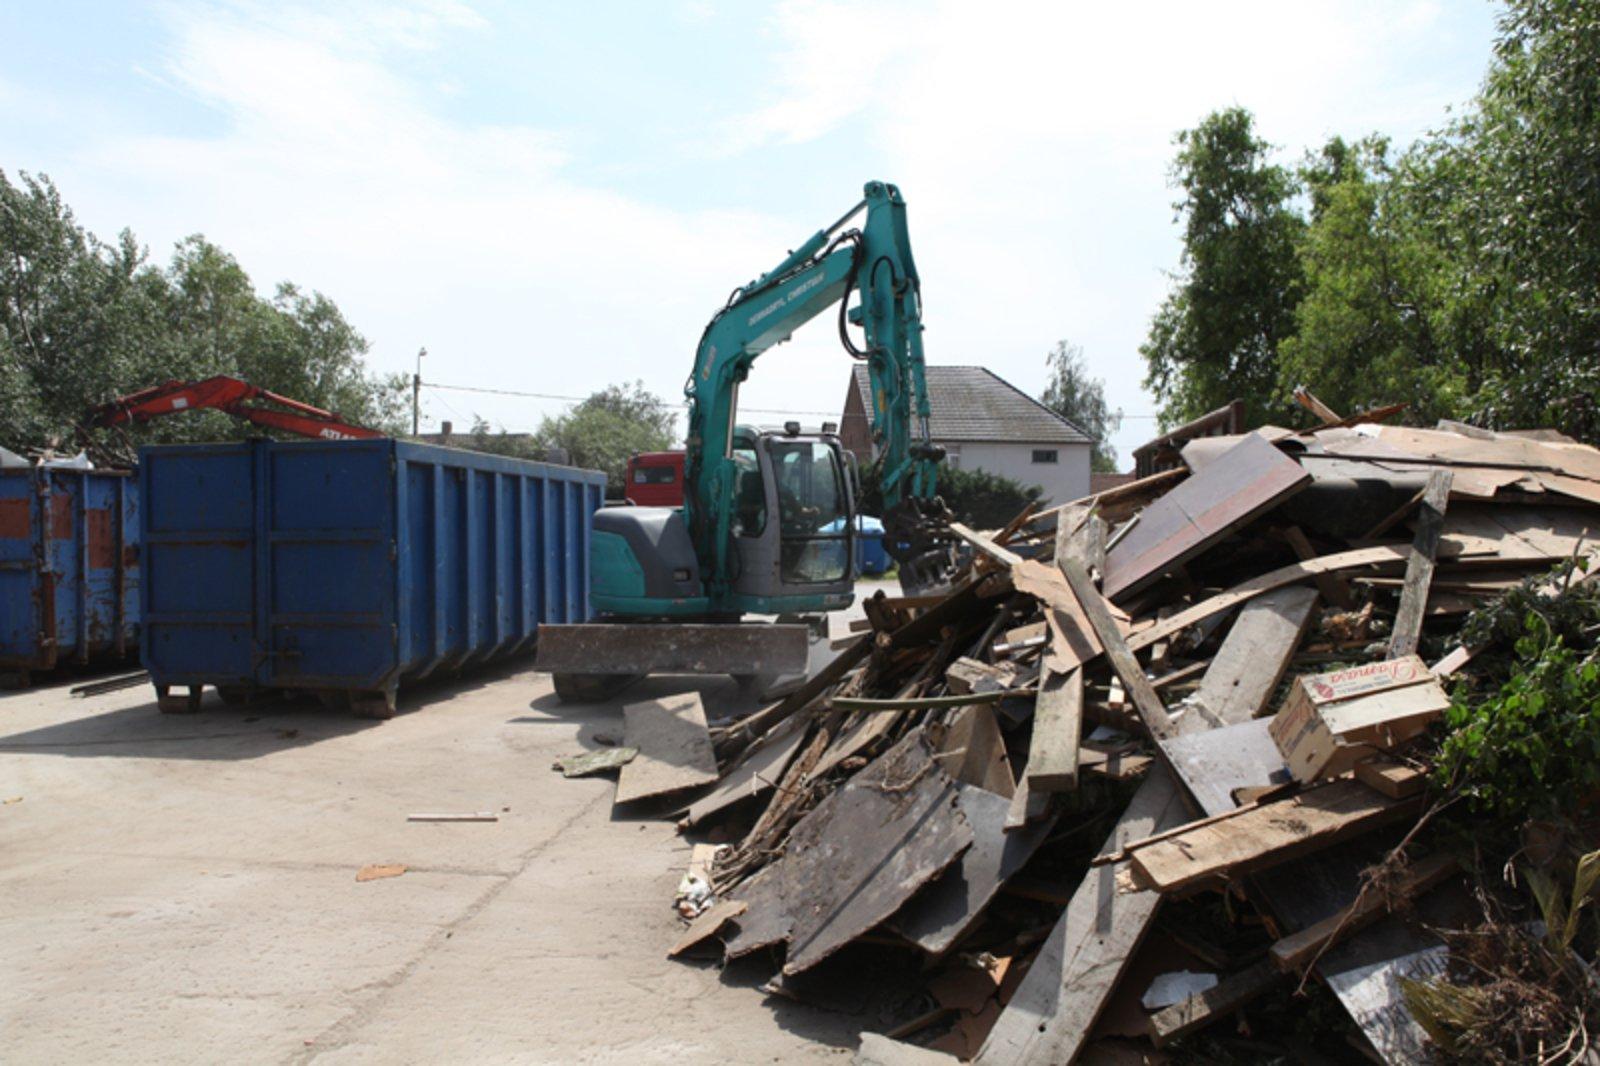 Containerbedrijf Desmadryl - Home